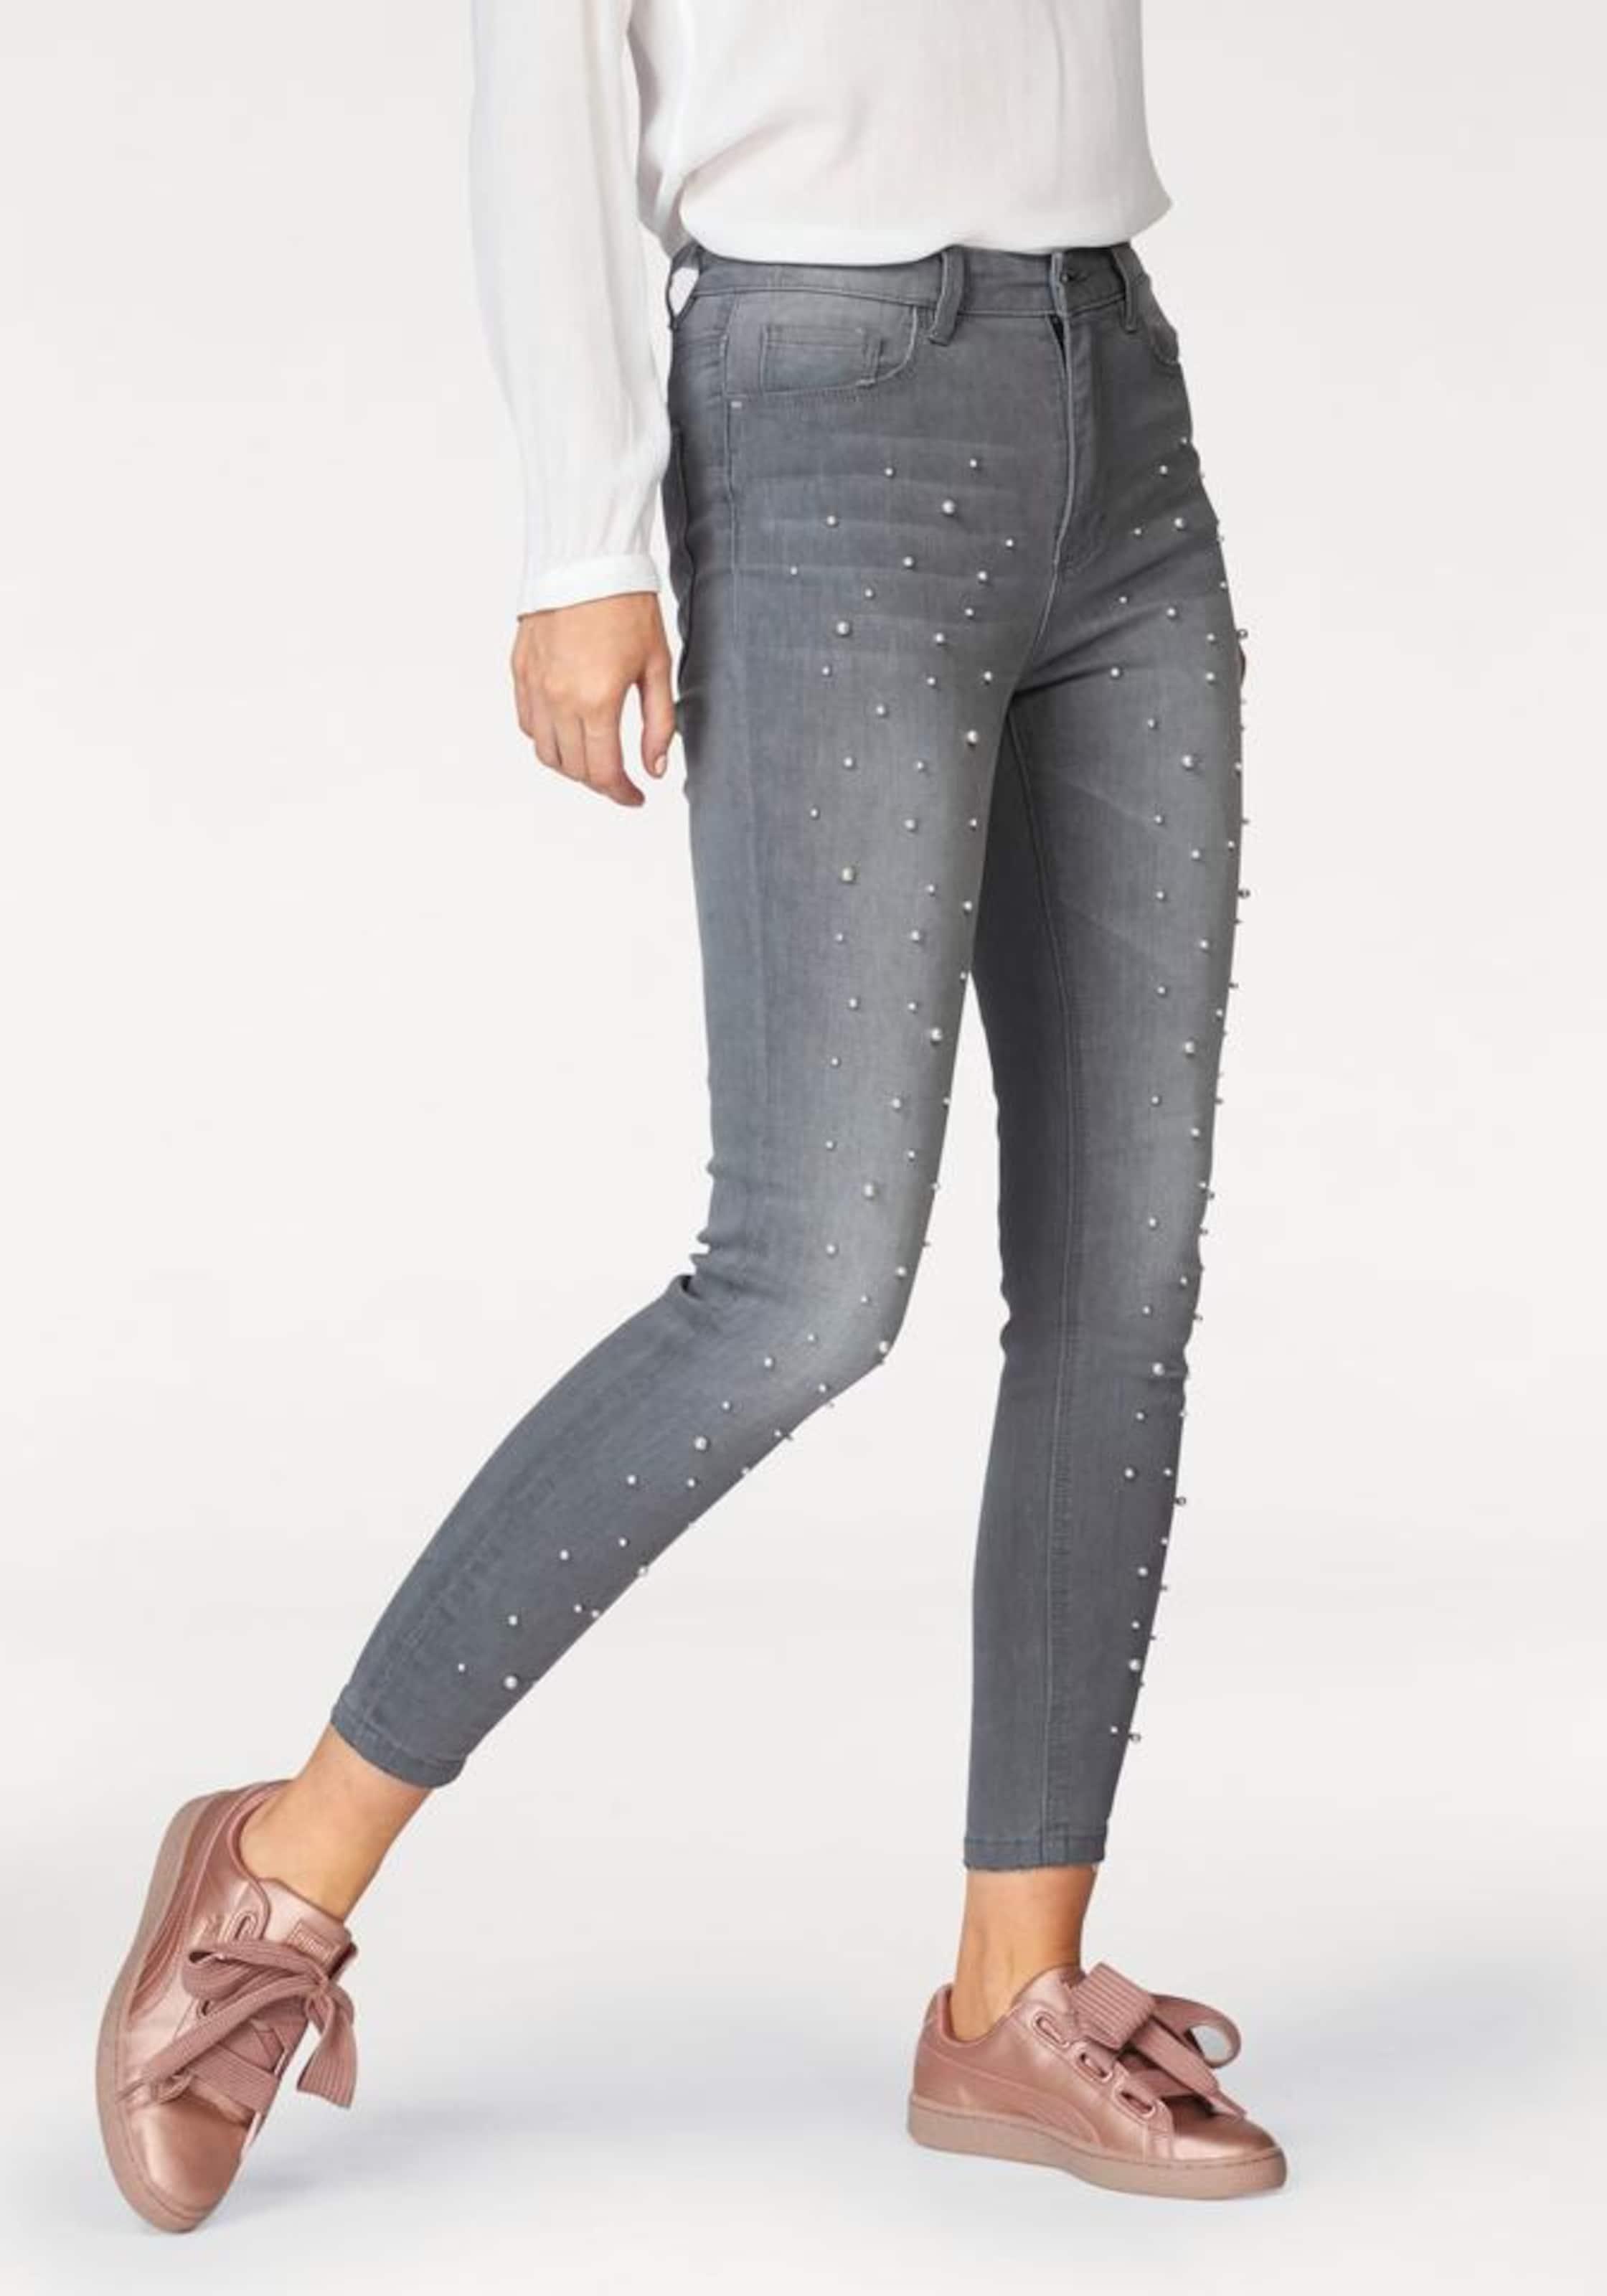 AJC 5-Pocket-Jeans Online-Shopping-Original Rabatt Bilder Unter Online-Verkauf NW3I3